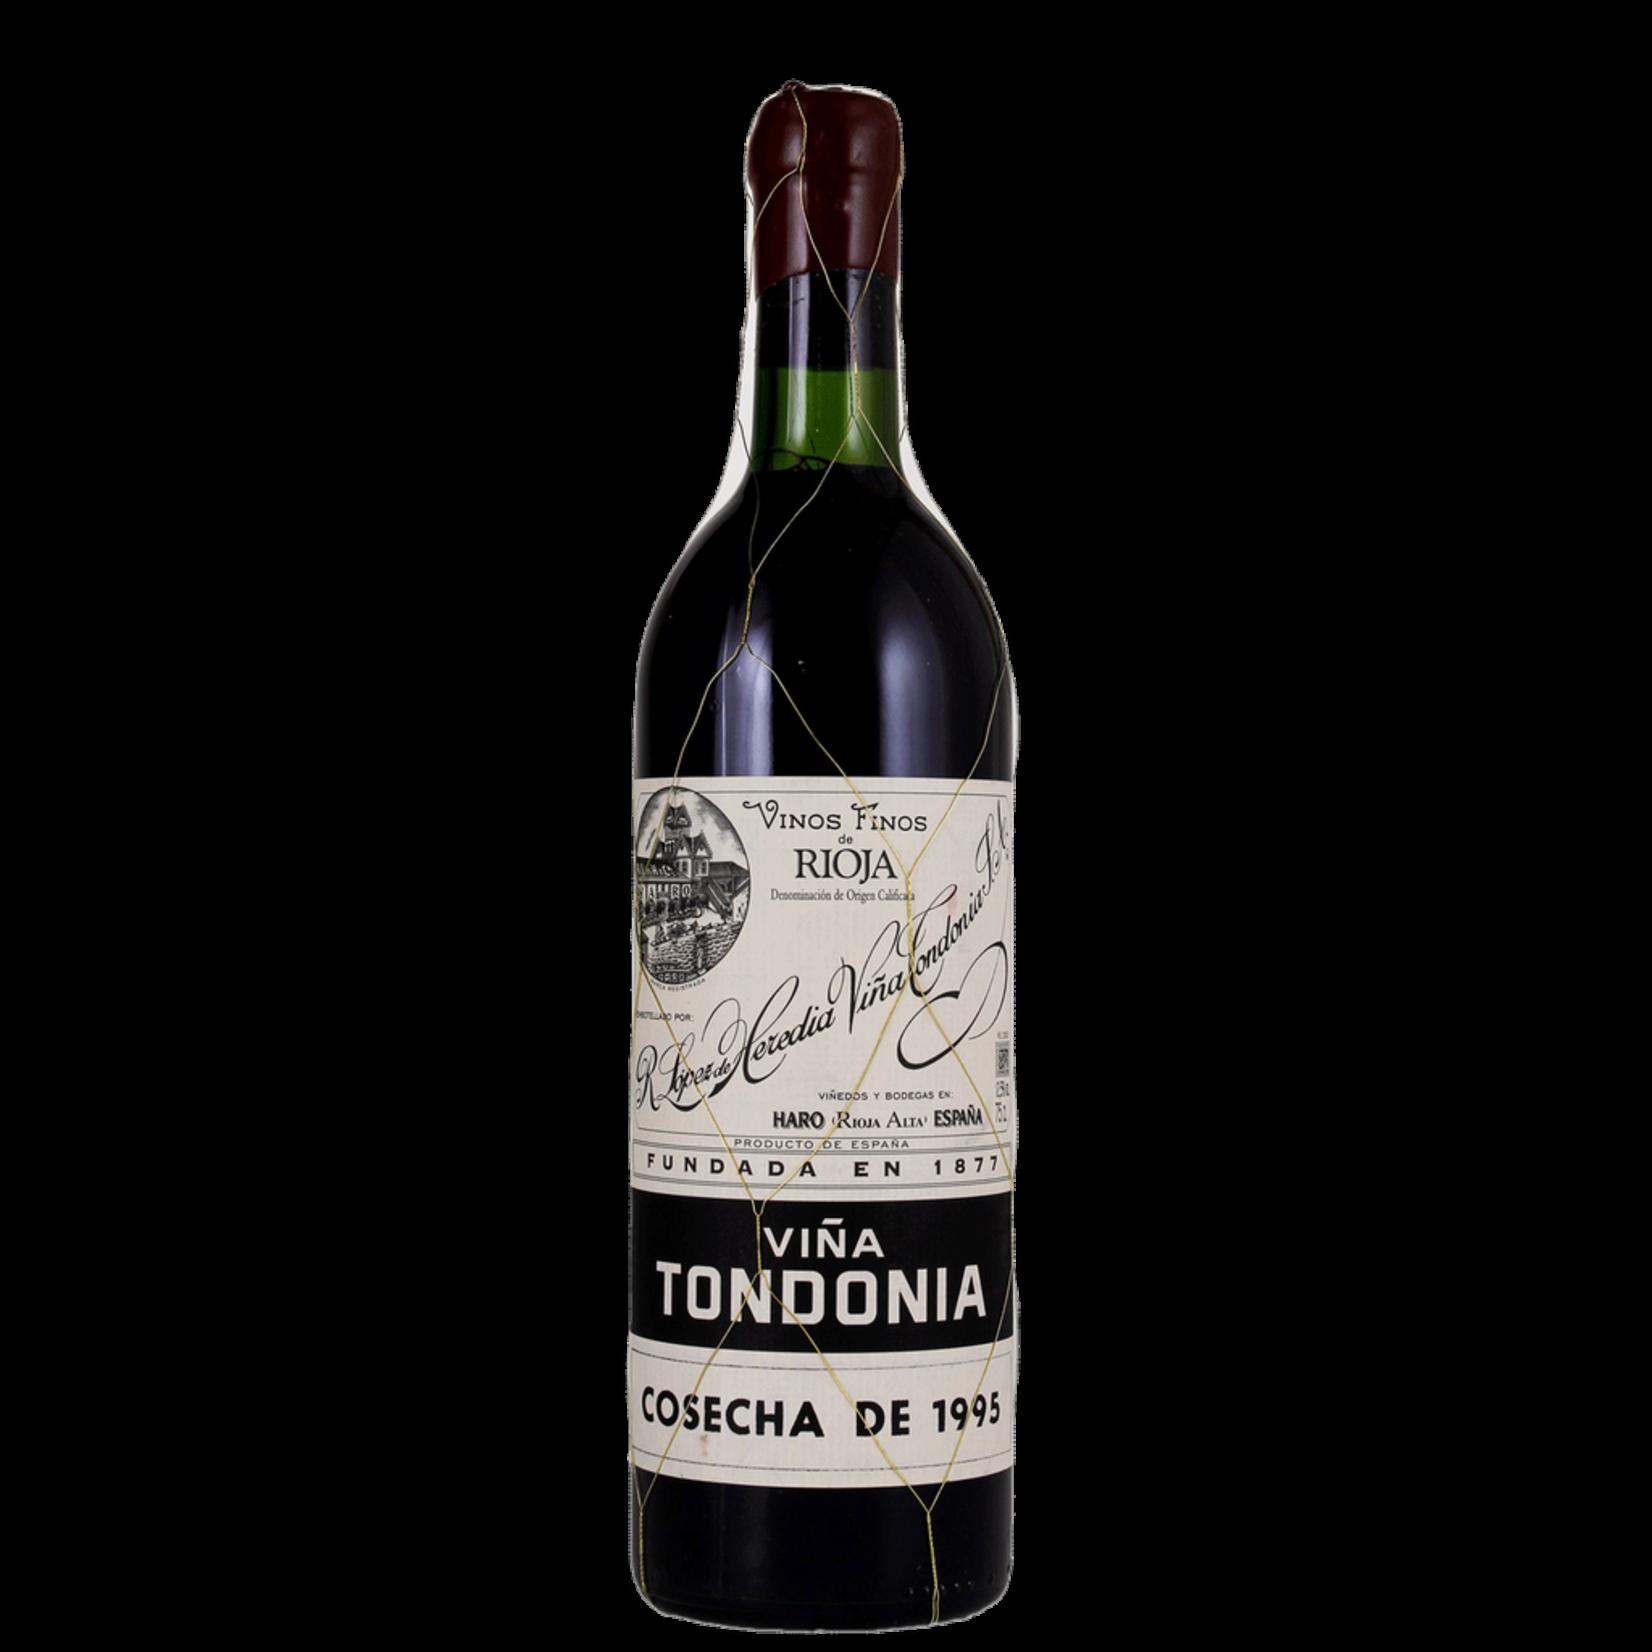 Wine Lopez de Heredia Rioja Tondonia Gran Reserva 1995